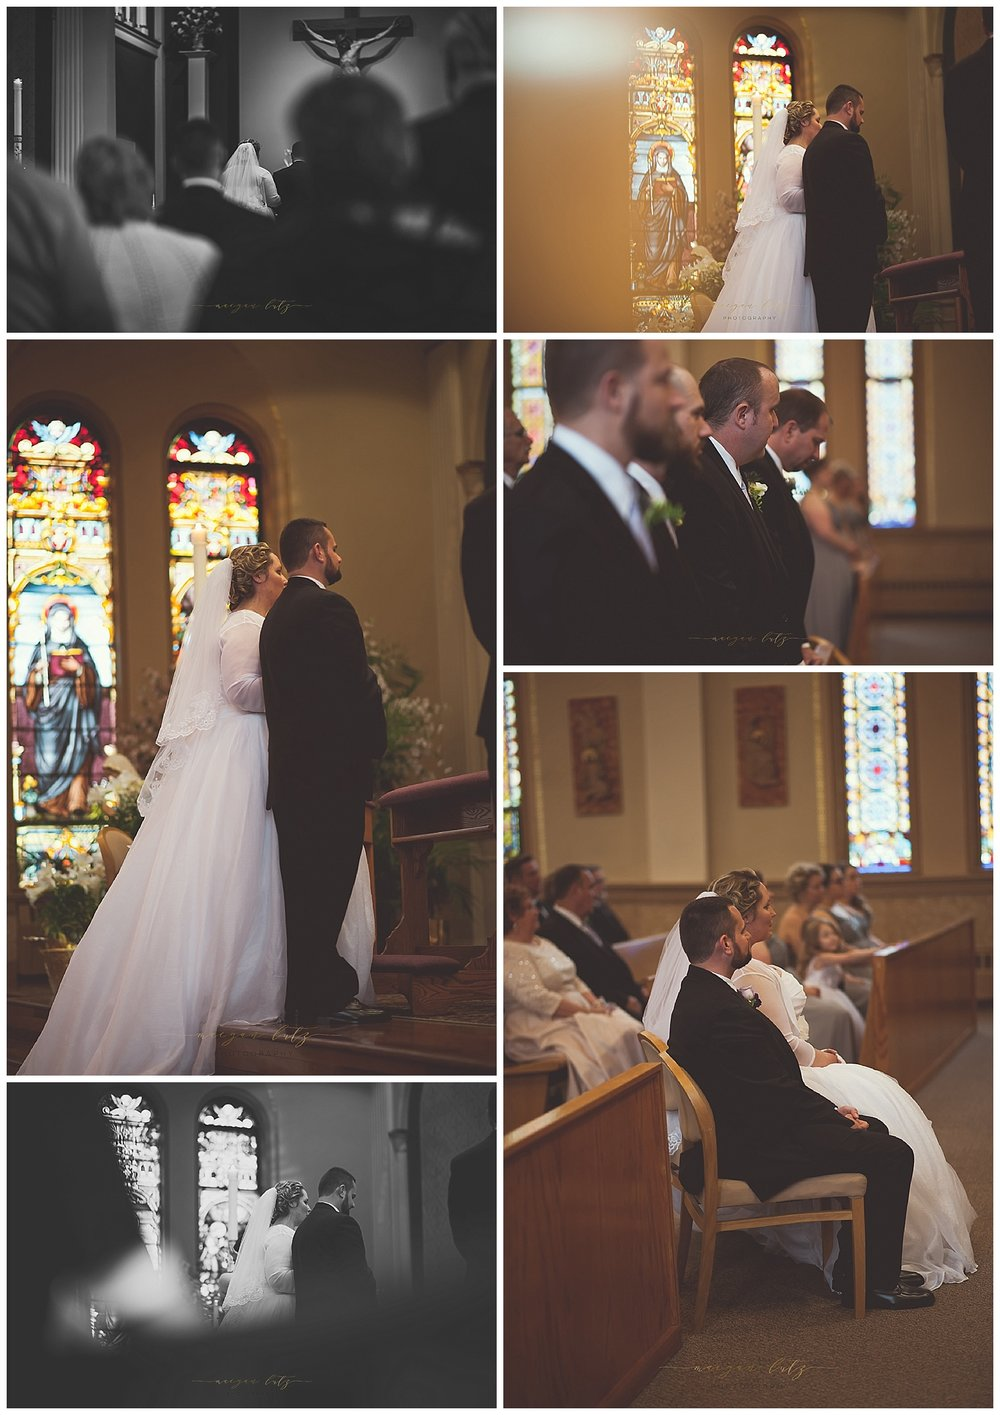 NEPA-Catholic-Wedding-Photographer-in-Scranton-PA_0028.jpg